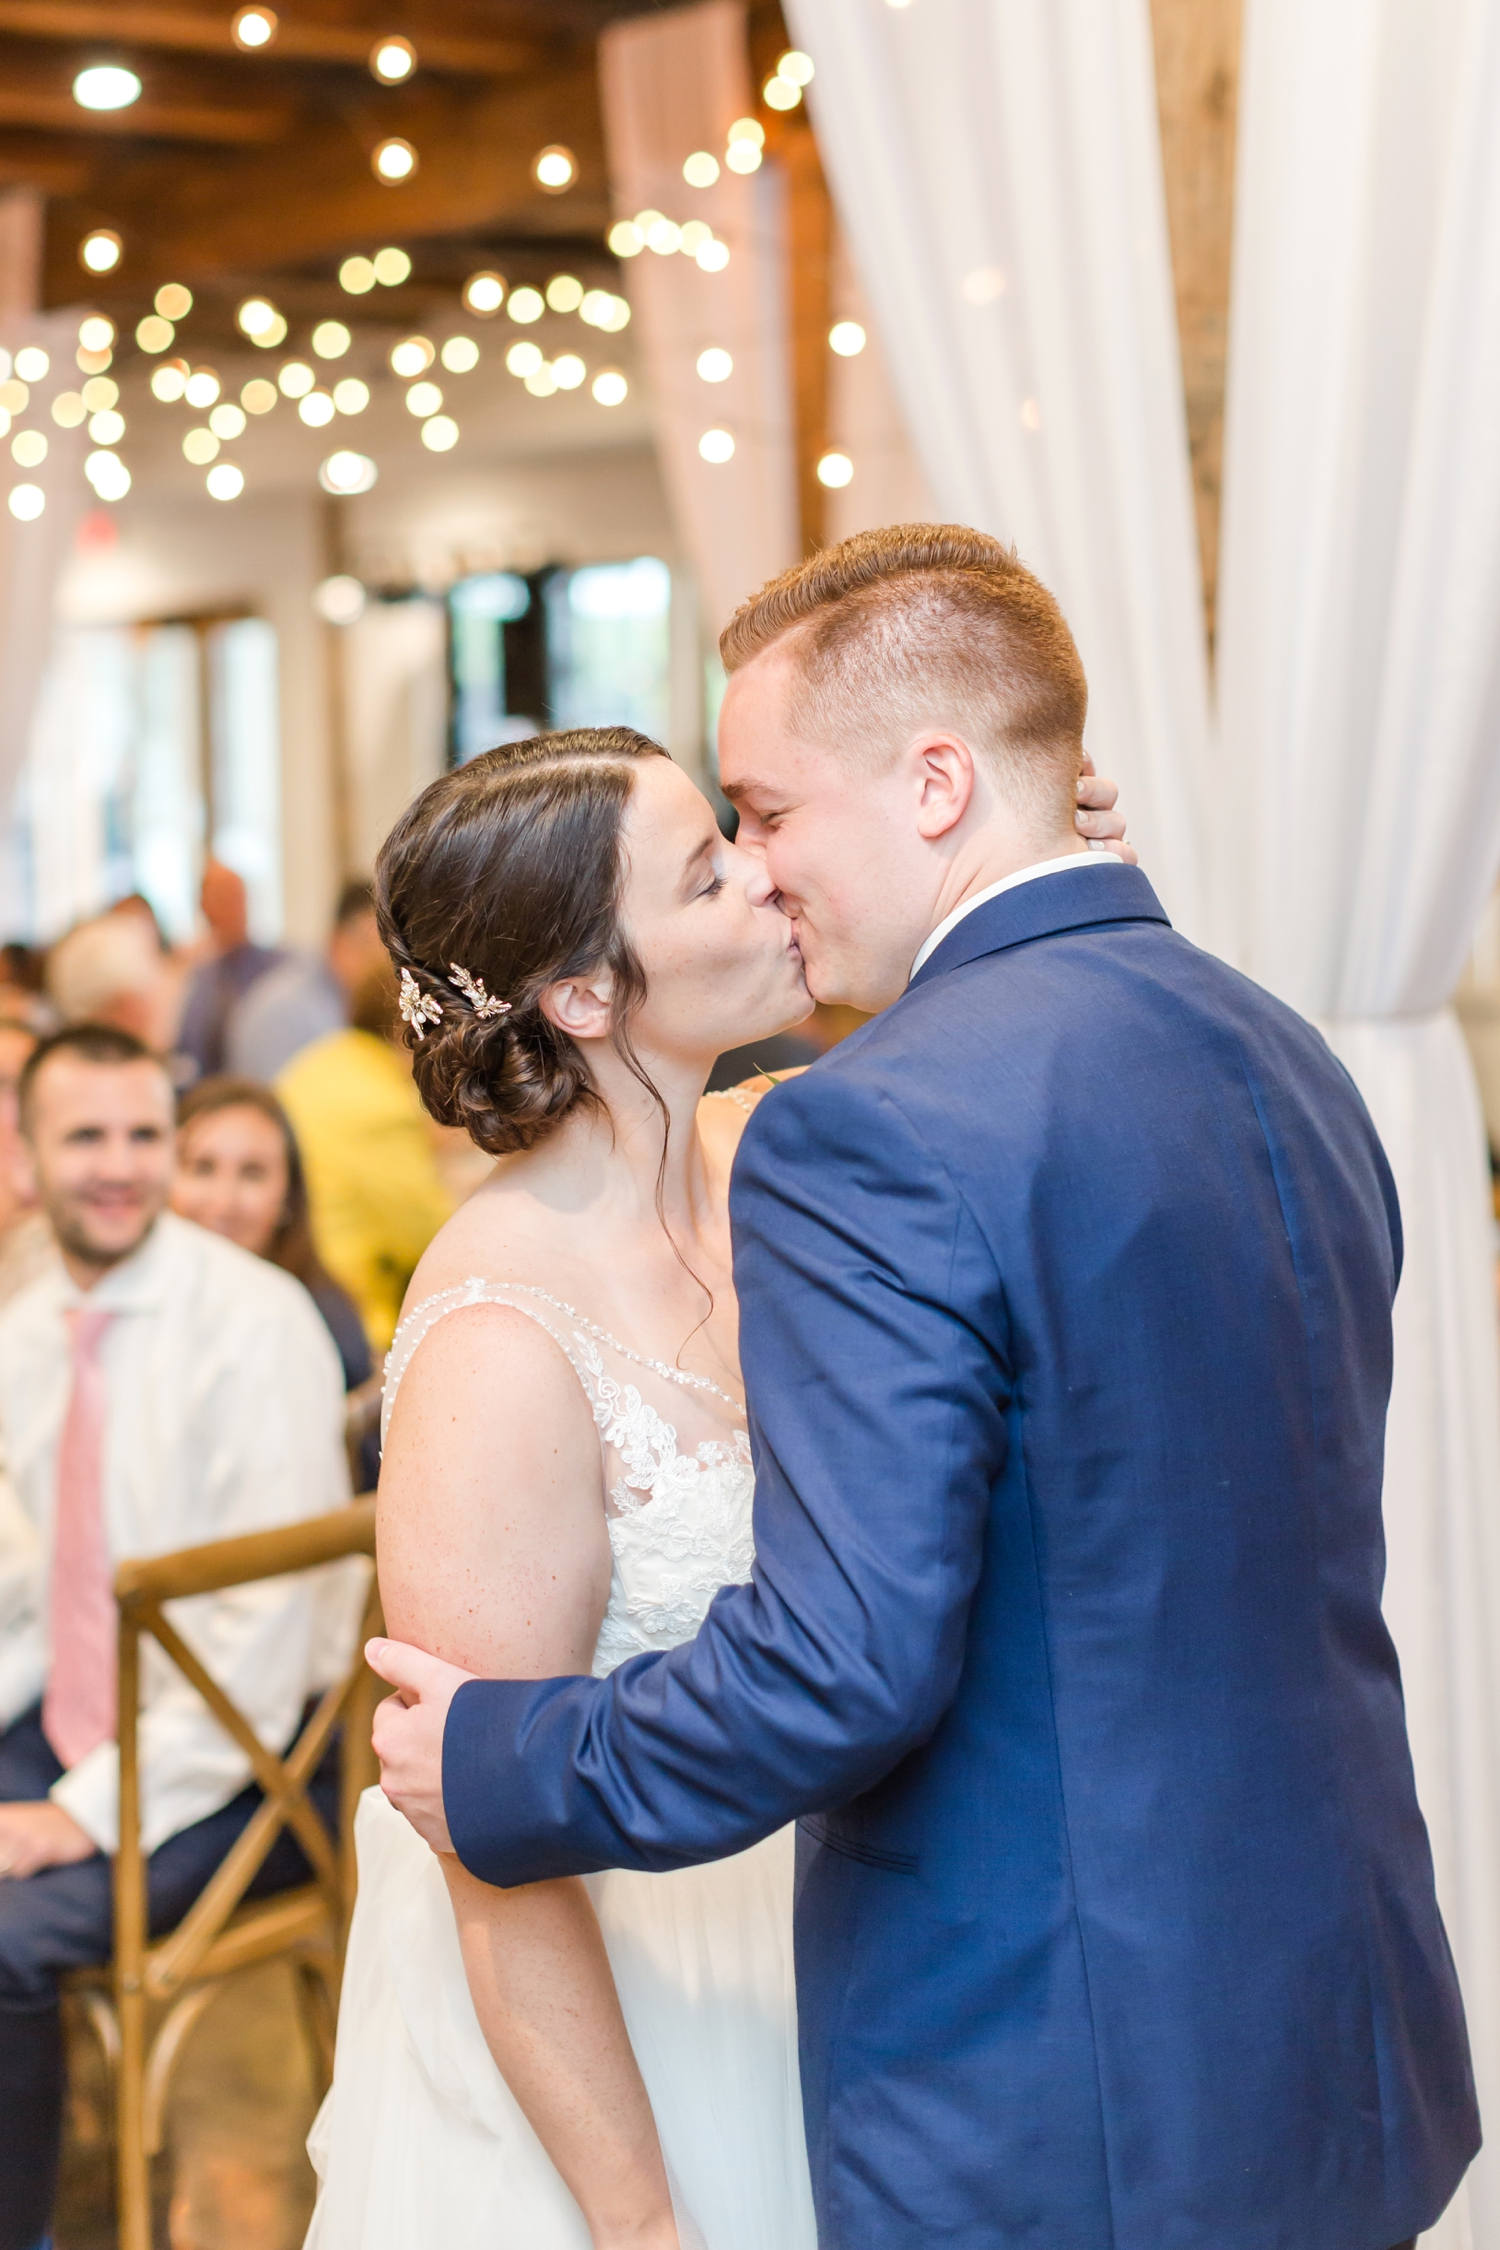 ADKINS WEDDING HIGHLIGHTS-305_The-Granary-wedding-Valley-Pike-Farm-Market-Virginia-wedding-photographer-anna-grace-photography-photo.jpg